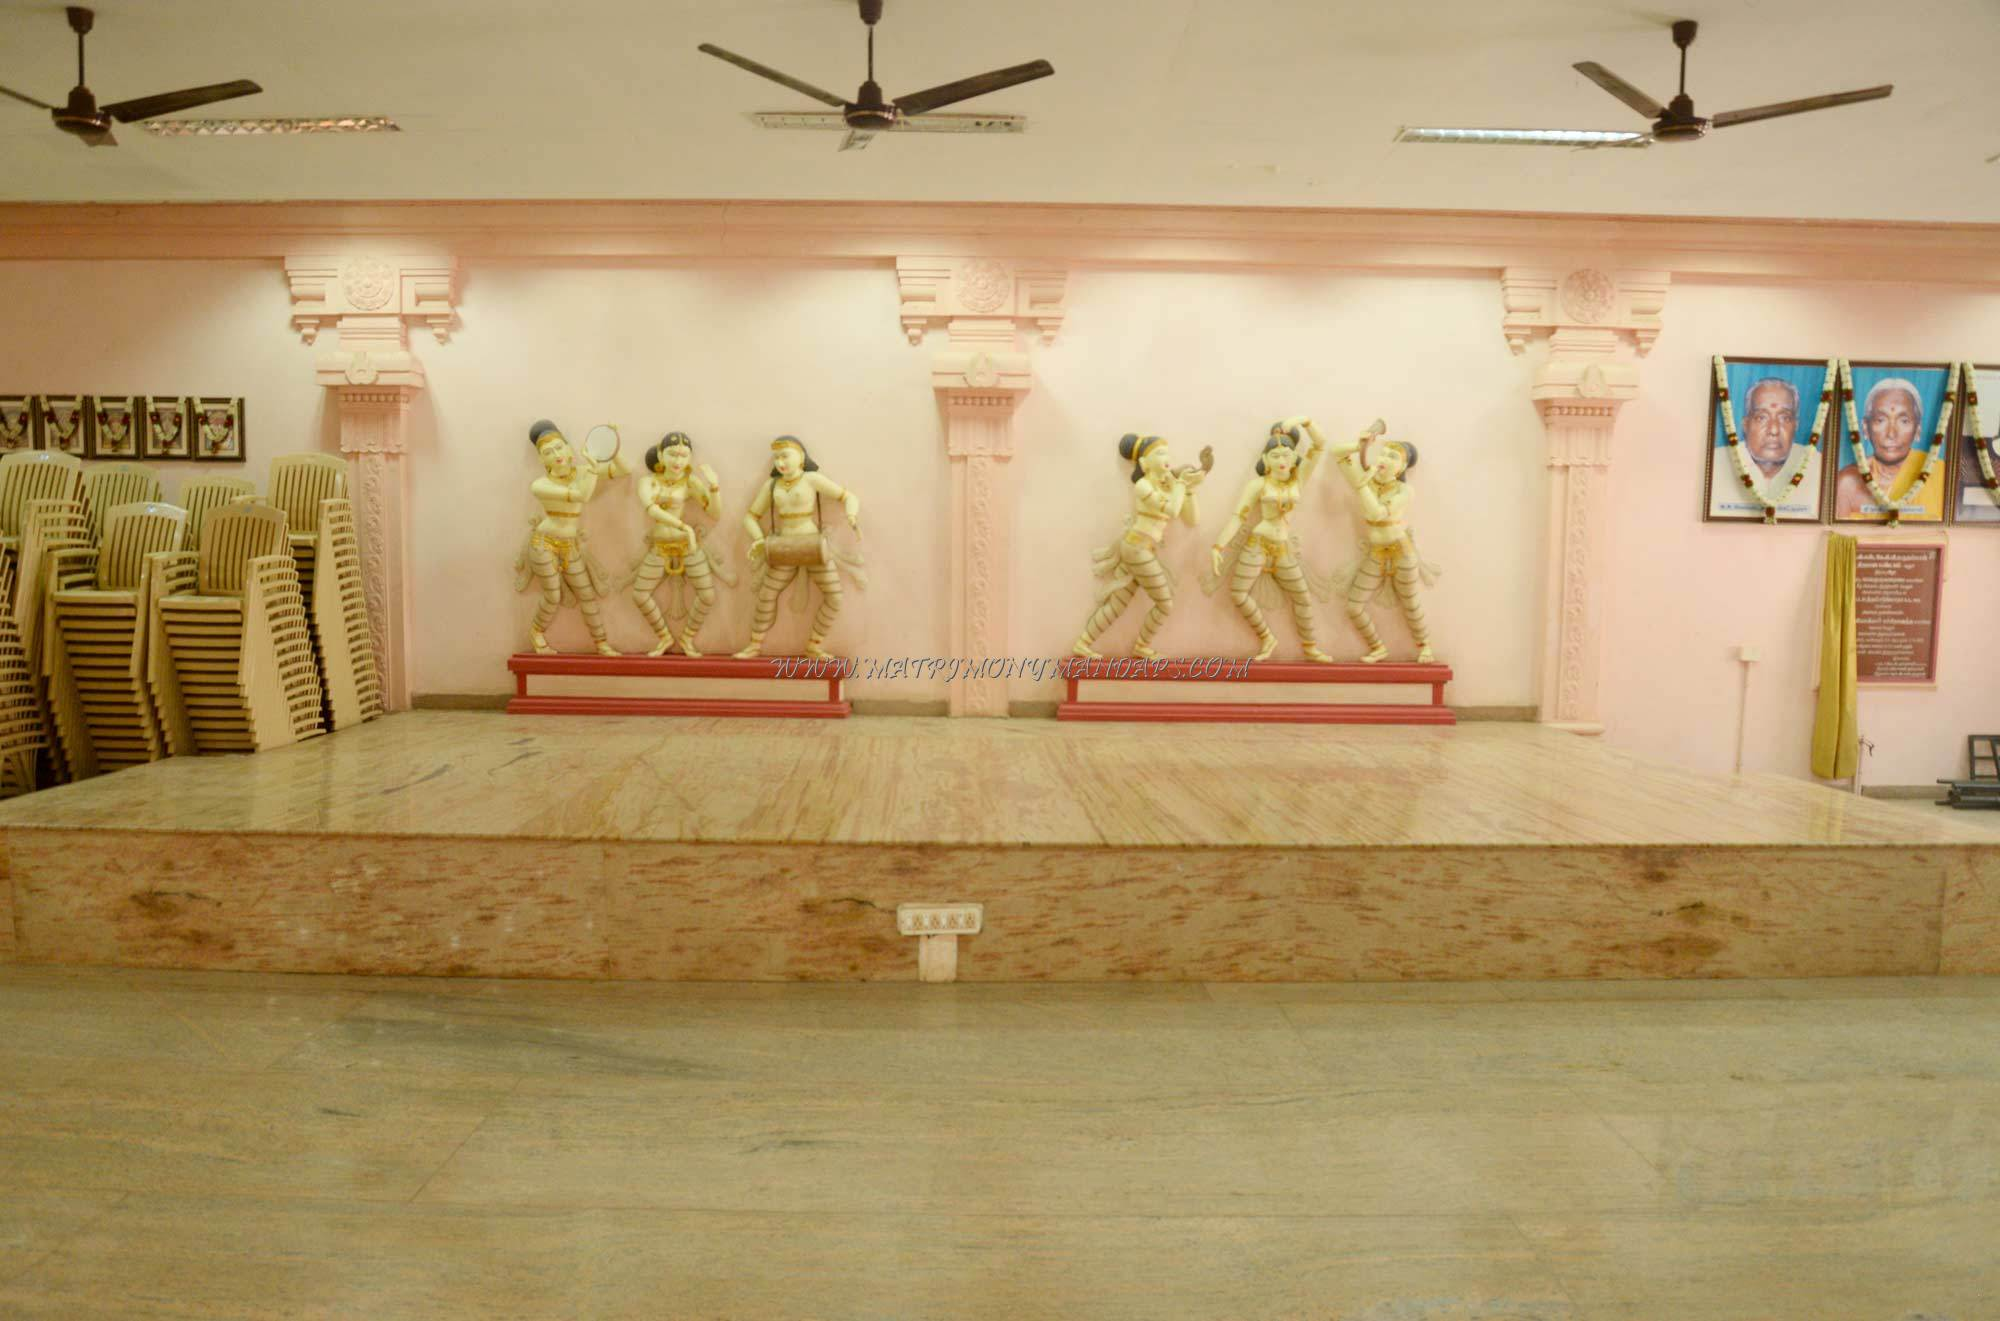 RVS KPV Maruthammal Thirumana Mandapam - Hall